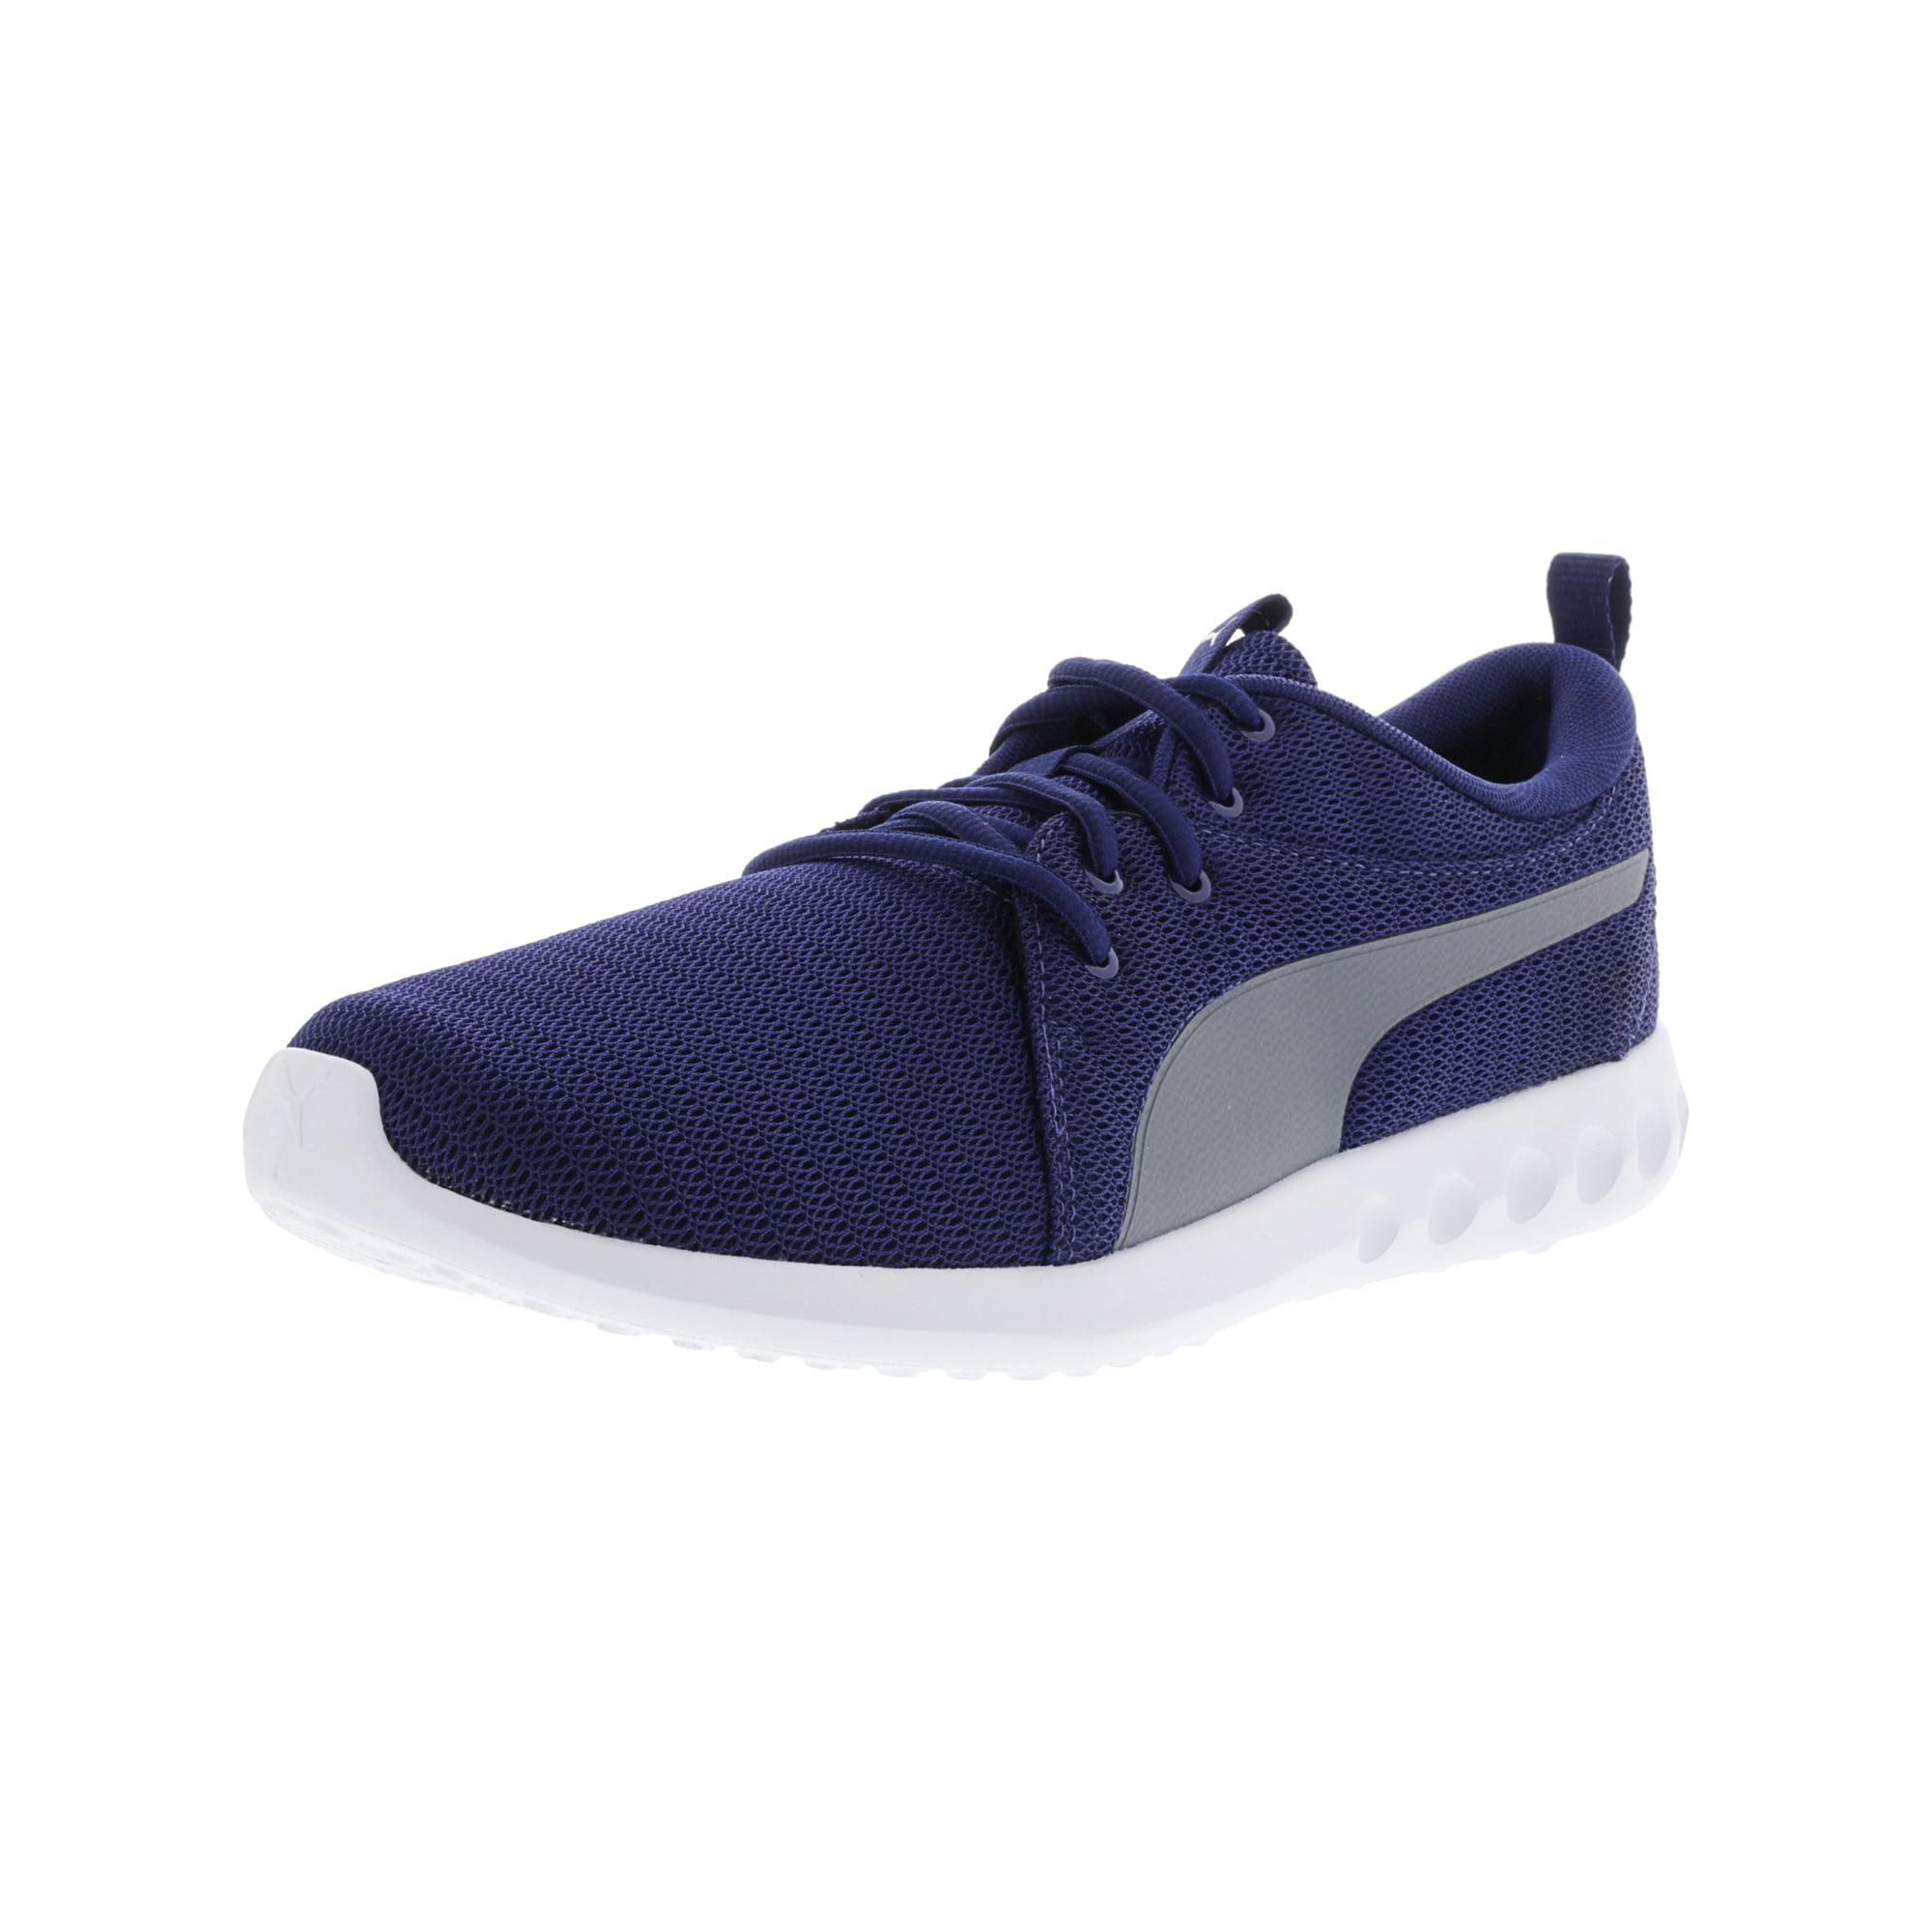 cbca4c8e2cf Puma Men s Carson 2 Blue Depths   Quiet Shade White Ankle-High Running Shoe  - 14M